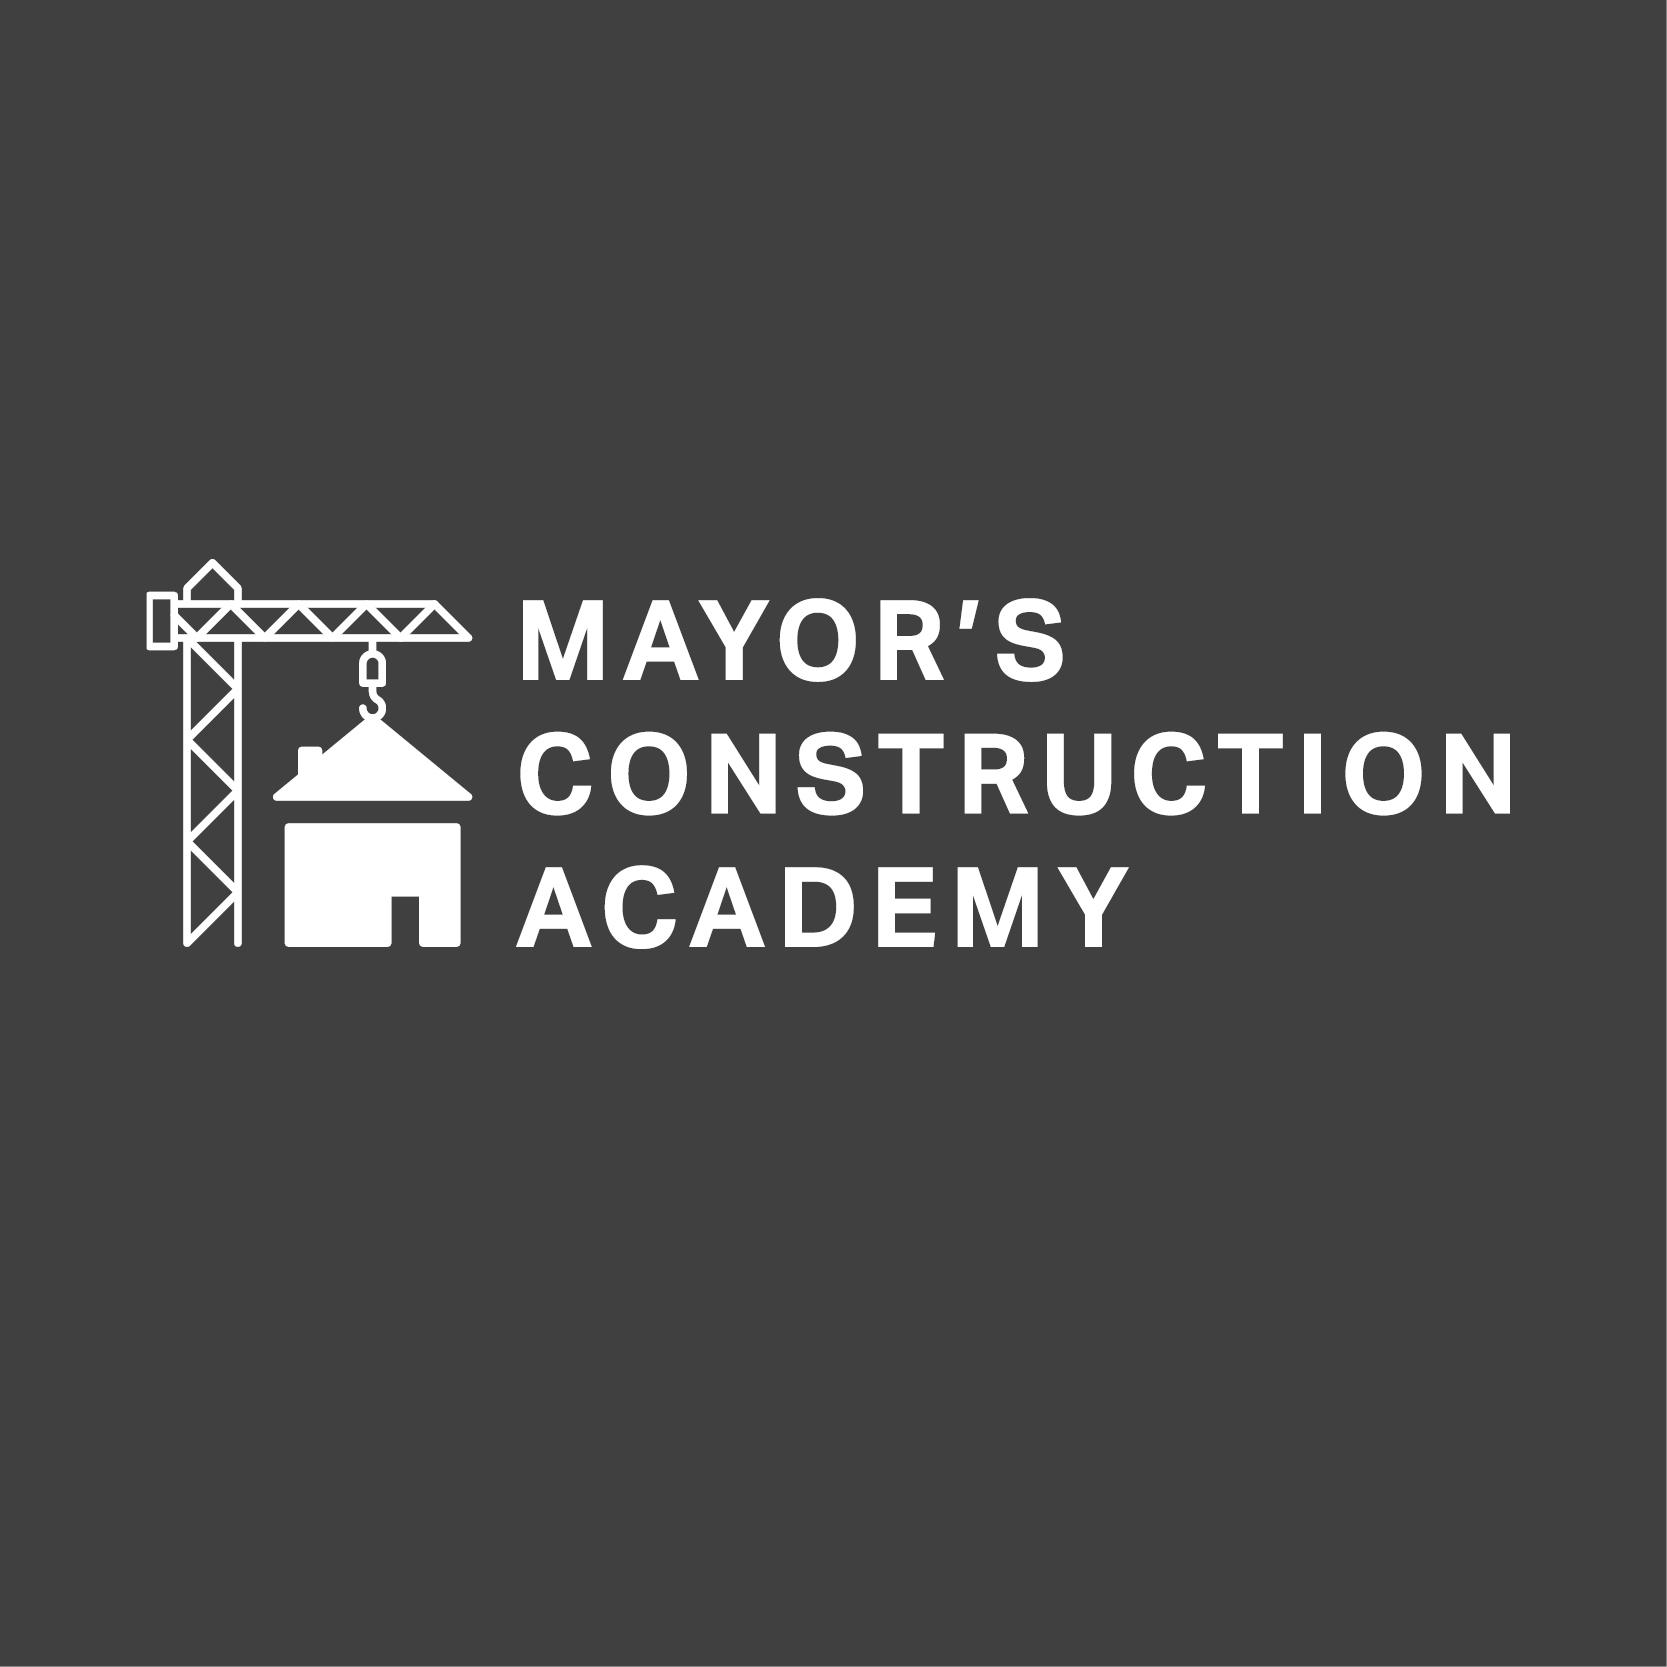 JRC Awarded the Mayor's Construction Academy Quality Mark!